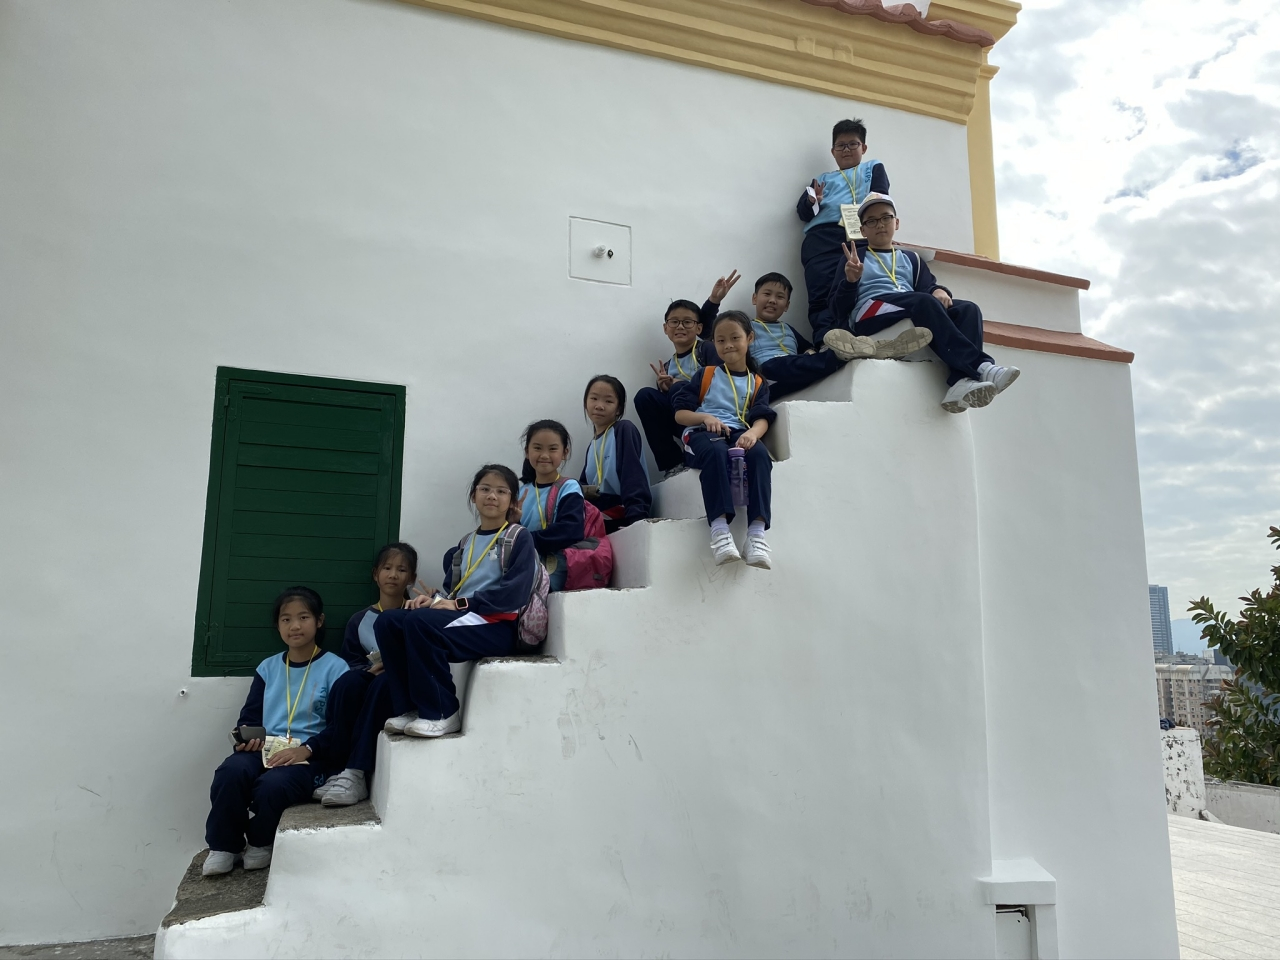 http://keito.school.hk/sites/default/files/batch_img_0851.jpg